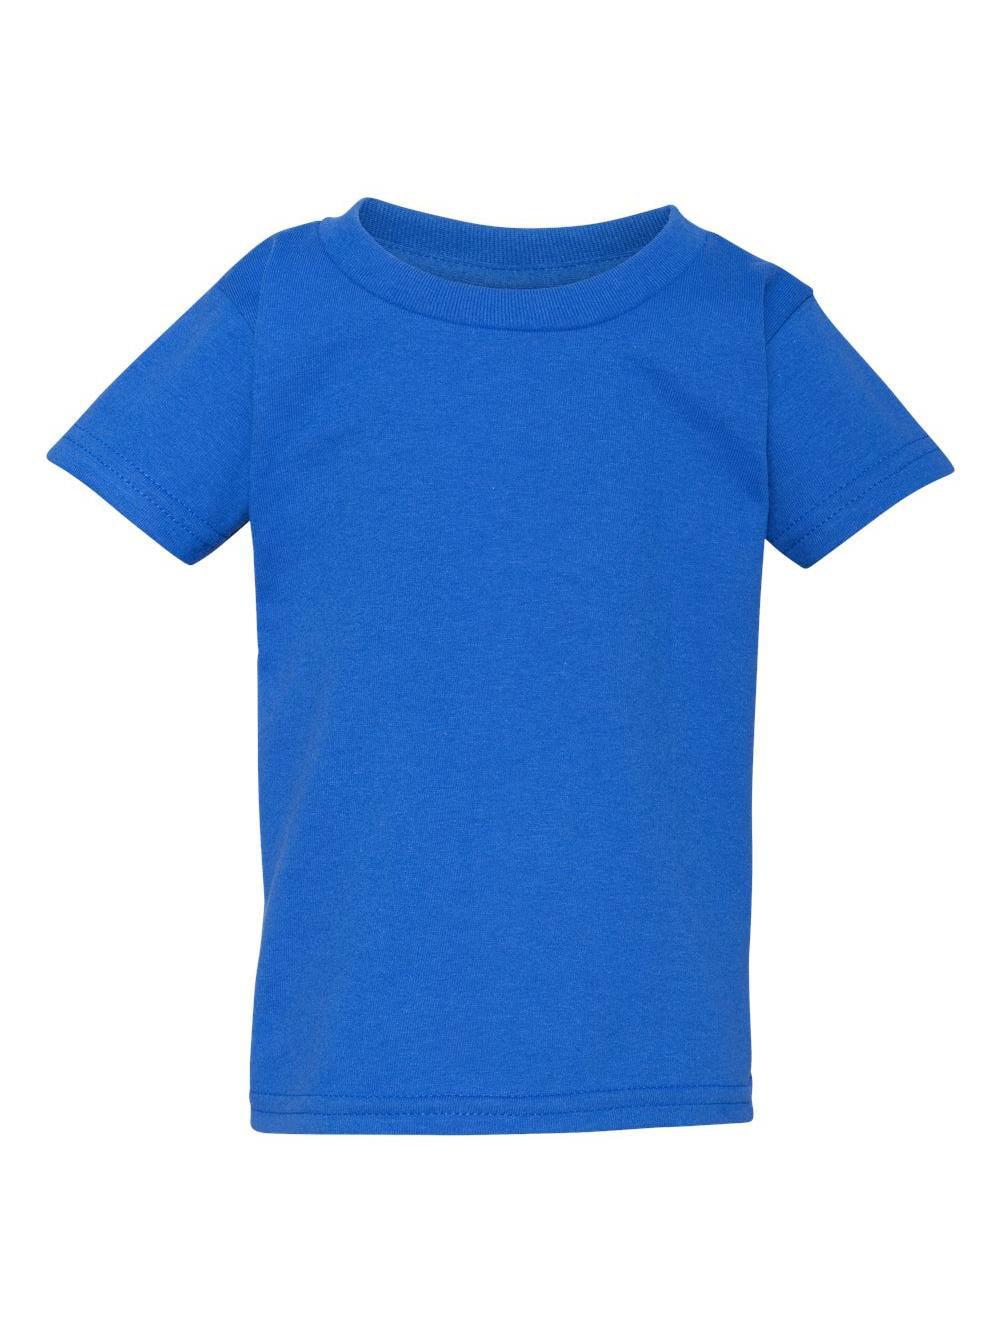 T-Shirts Heavy Cotton Toddler T-Shirt